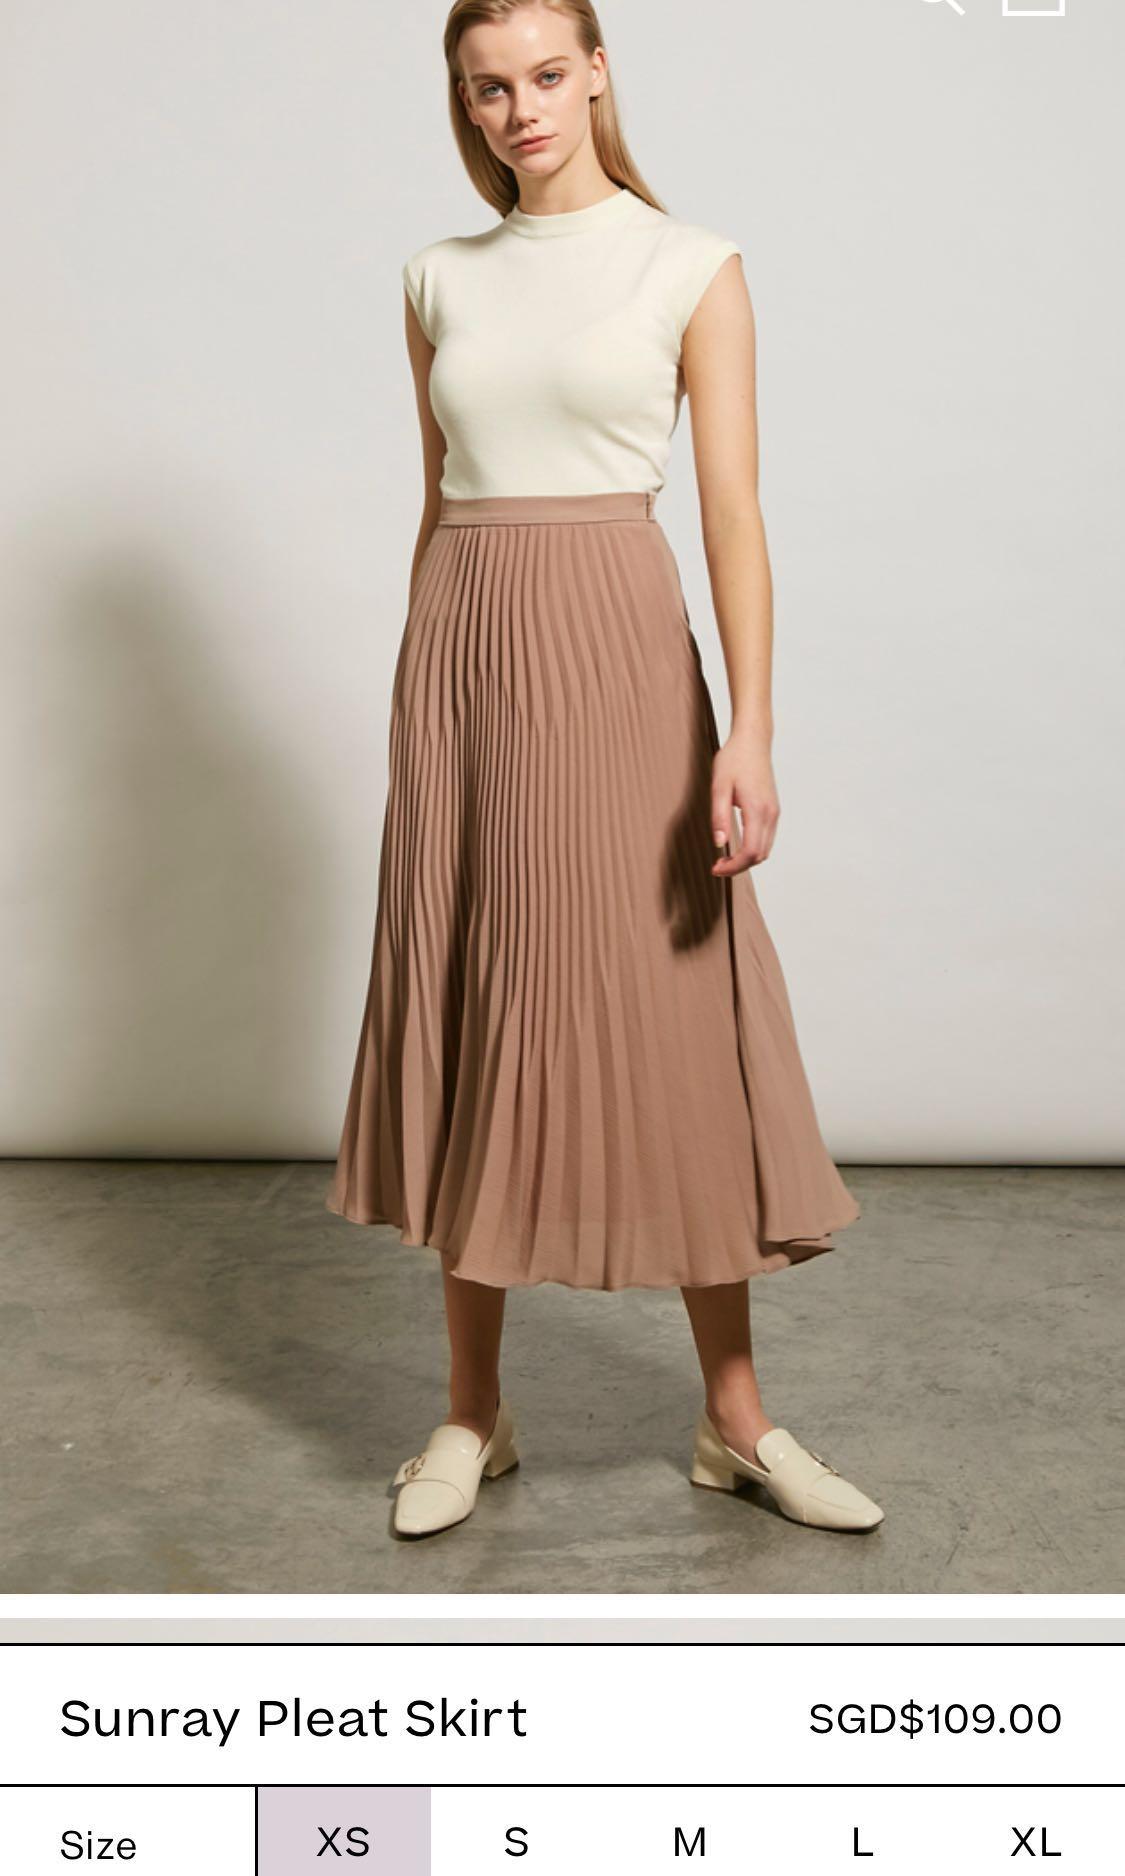 e53365048dc7 Ladies Sunray Pleated Skirts | Saddha